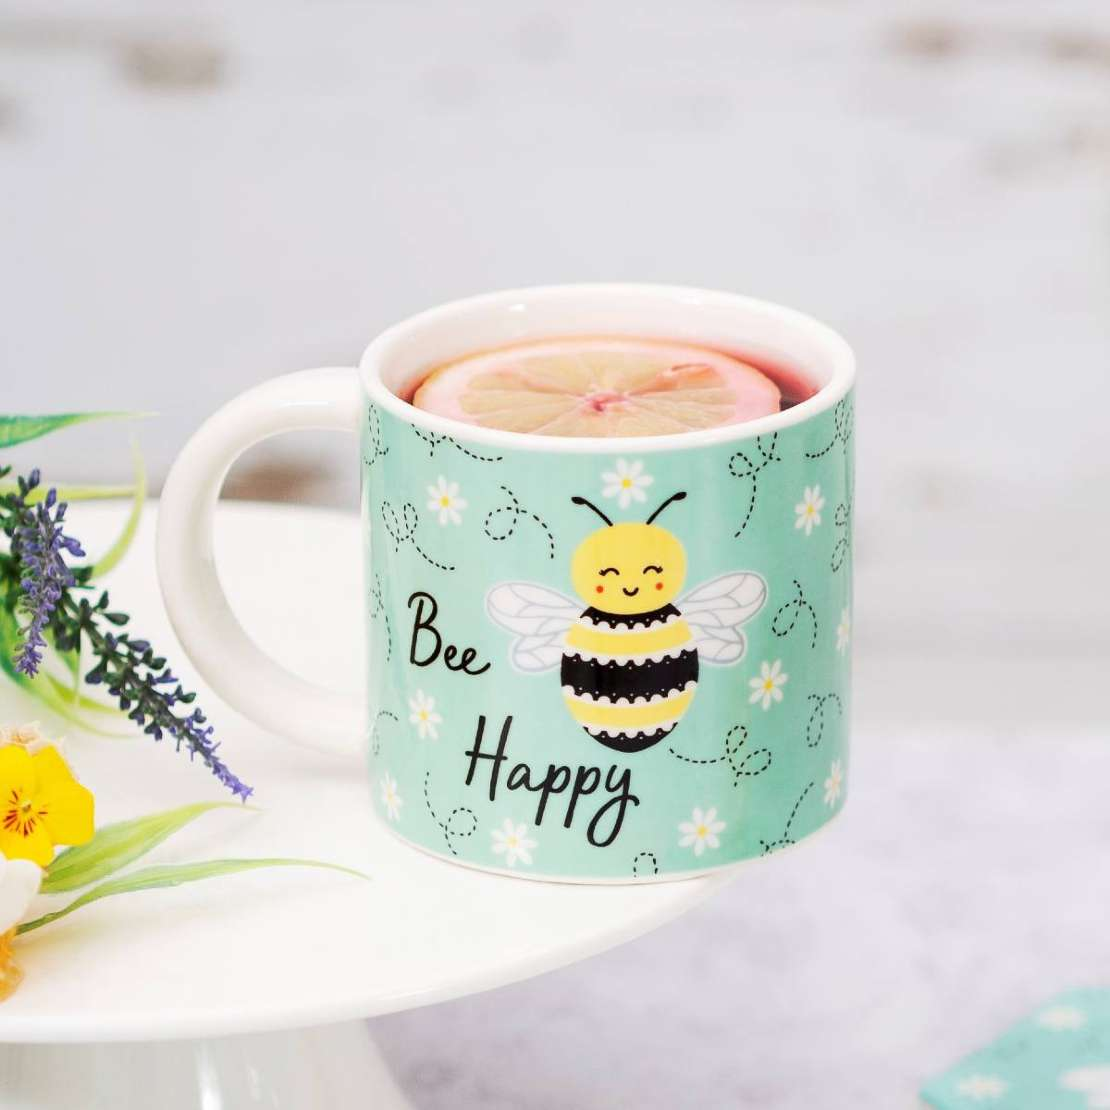 A little mug of wellness by Sasse & Belle